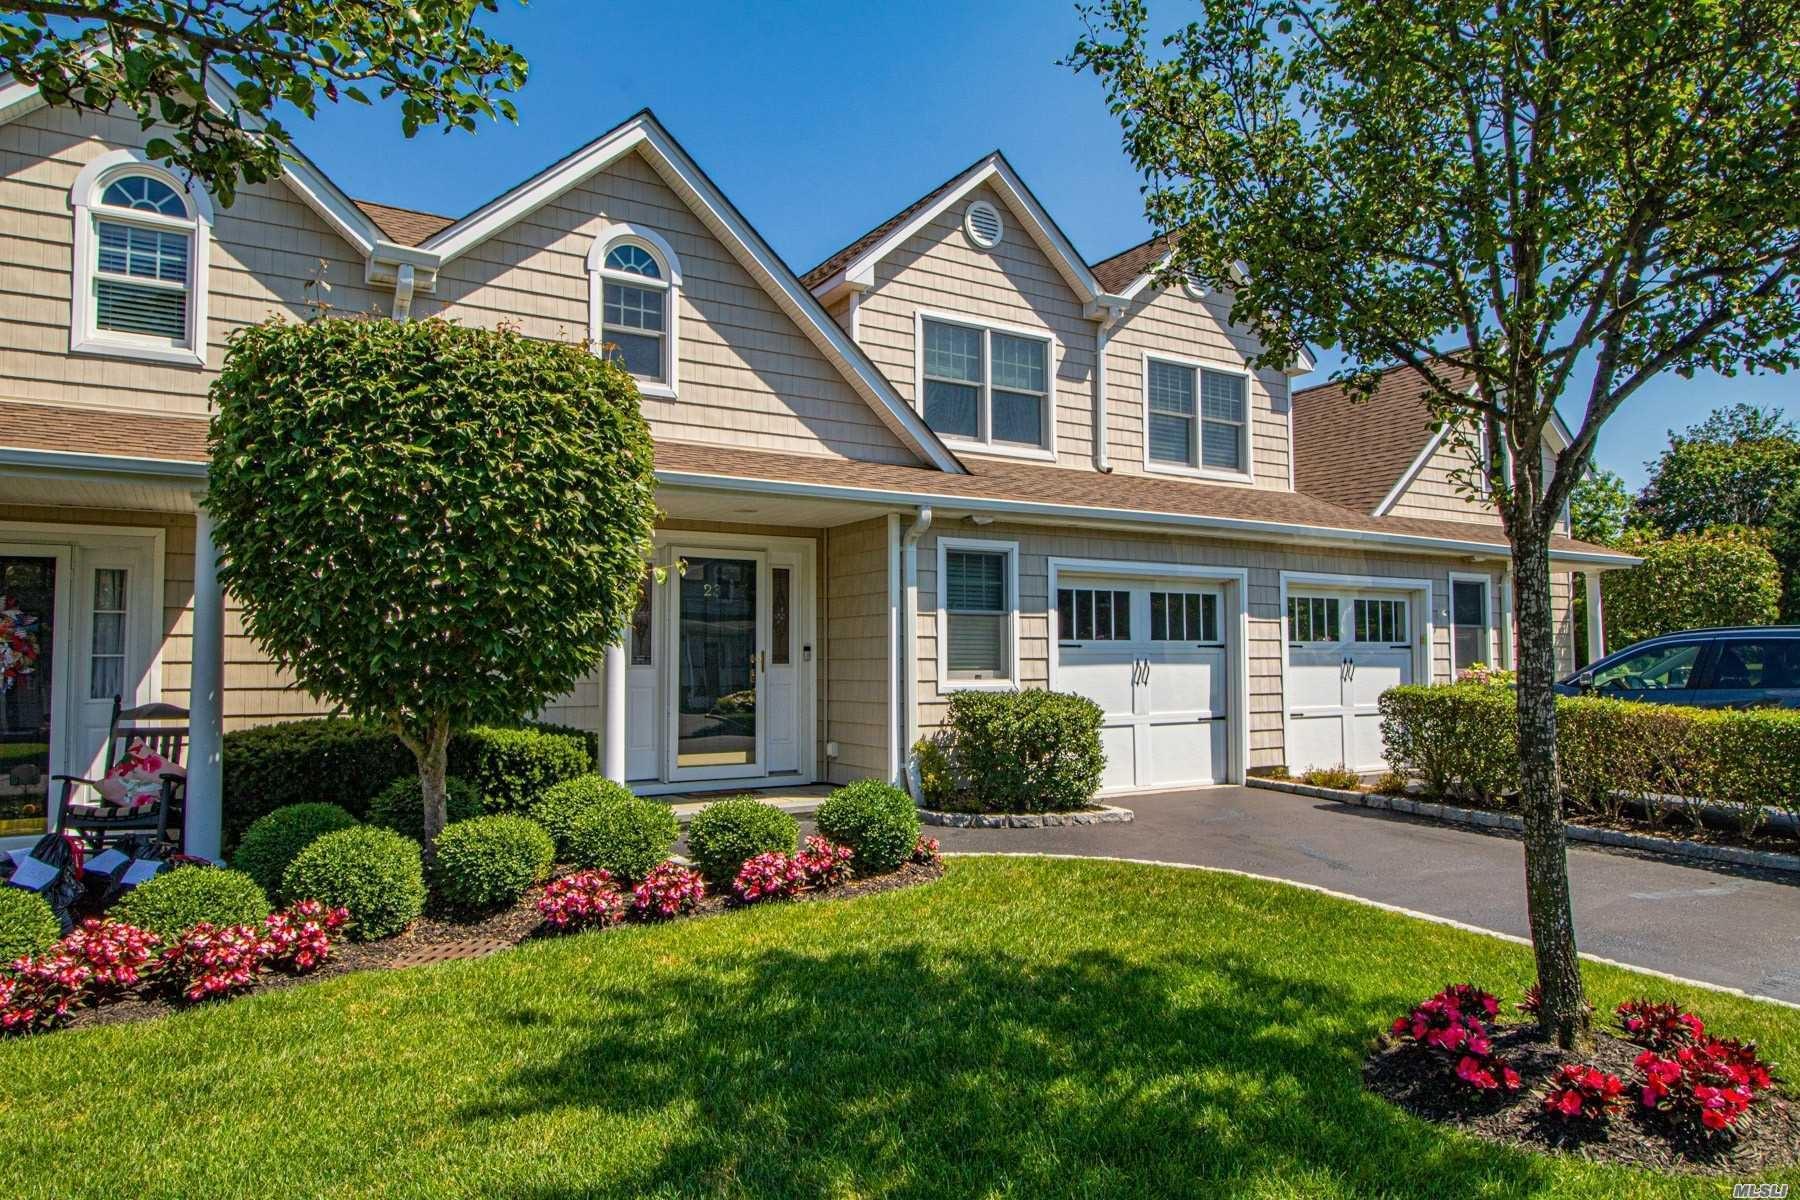 23 Coral Lane, Sayville, NY 11782 - MLS#: 3235900